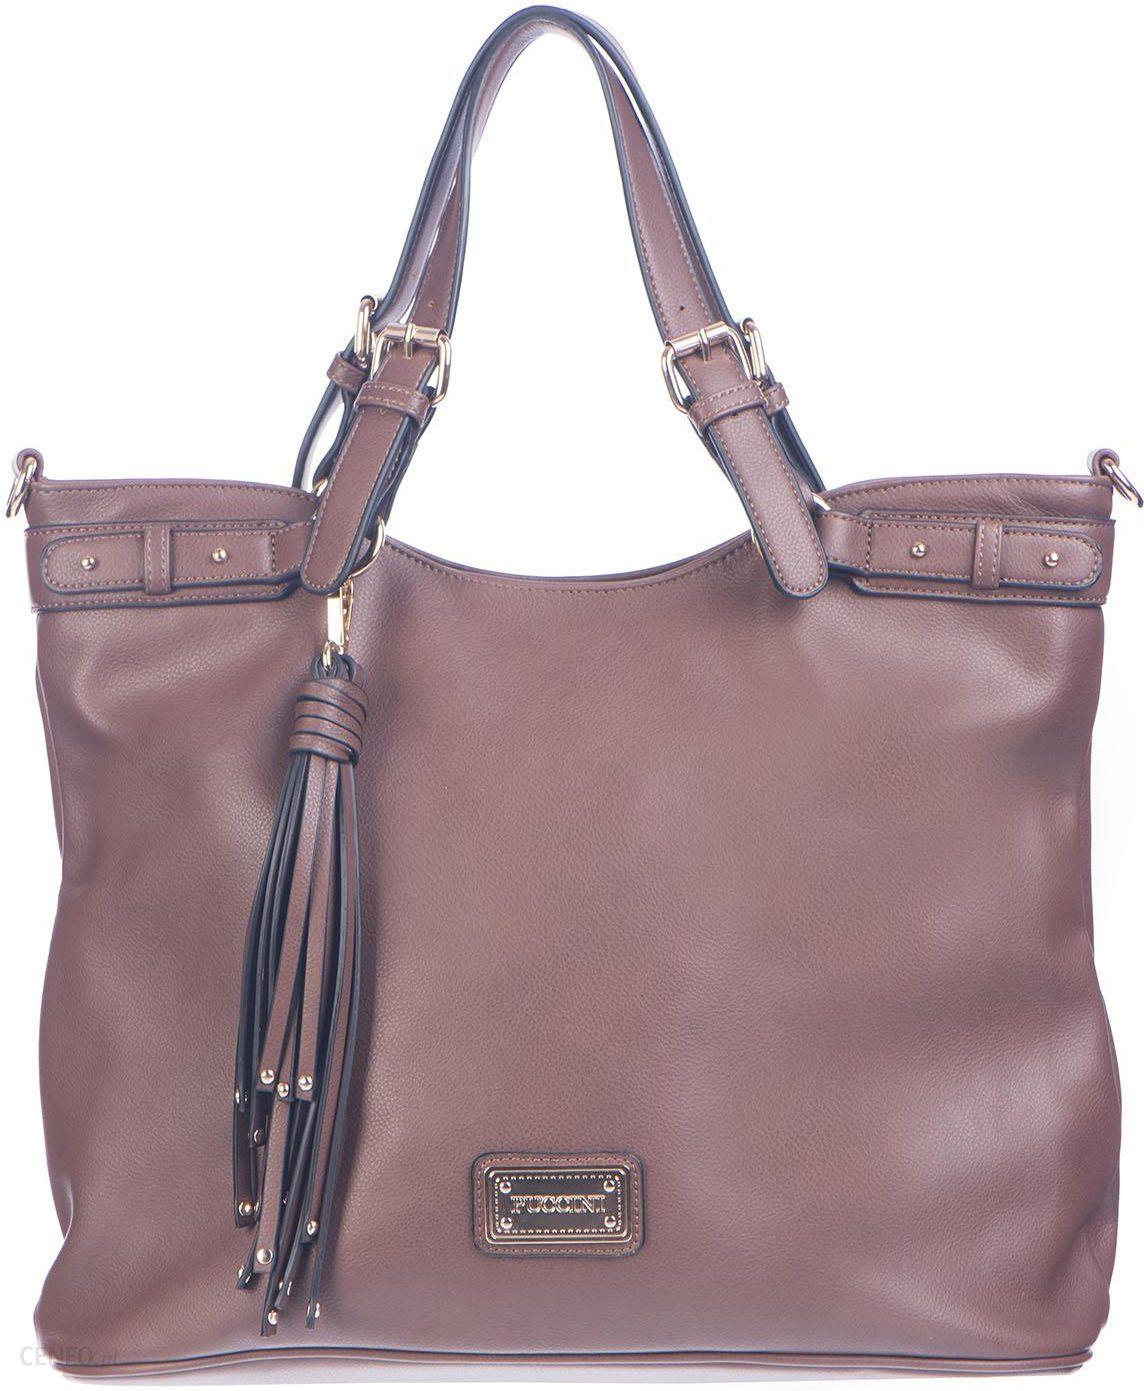 f0e42d790ecef Torebka Damski Fashion Collection - BT26350 2A - Ceny i opinie ...